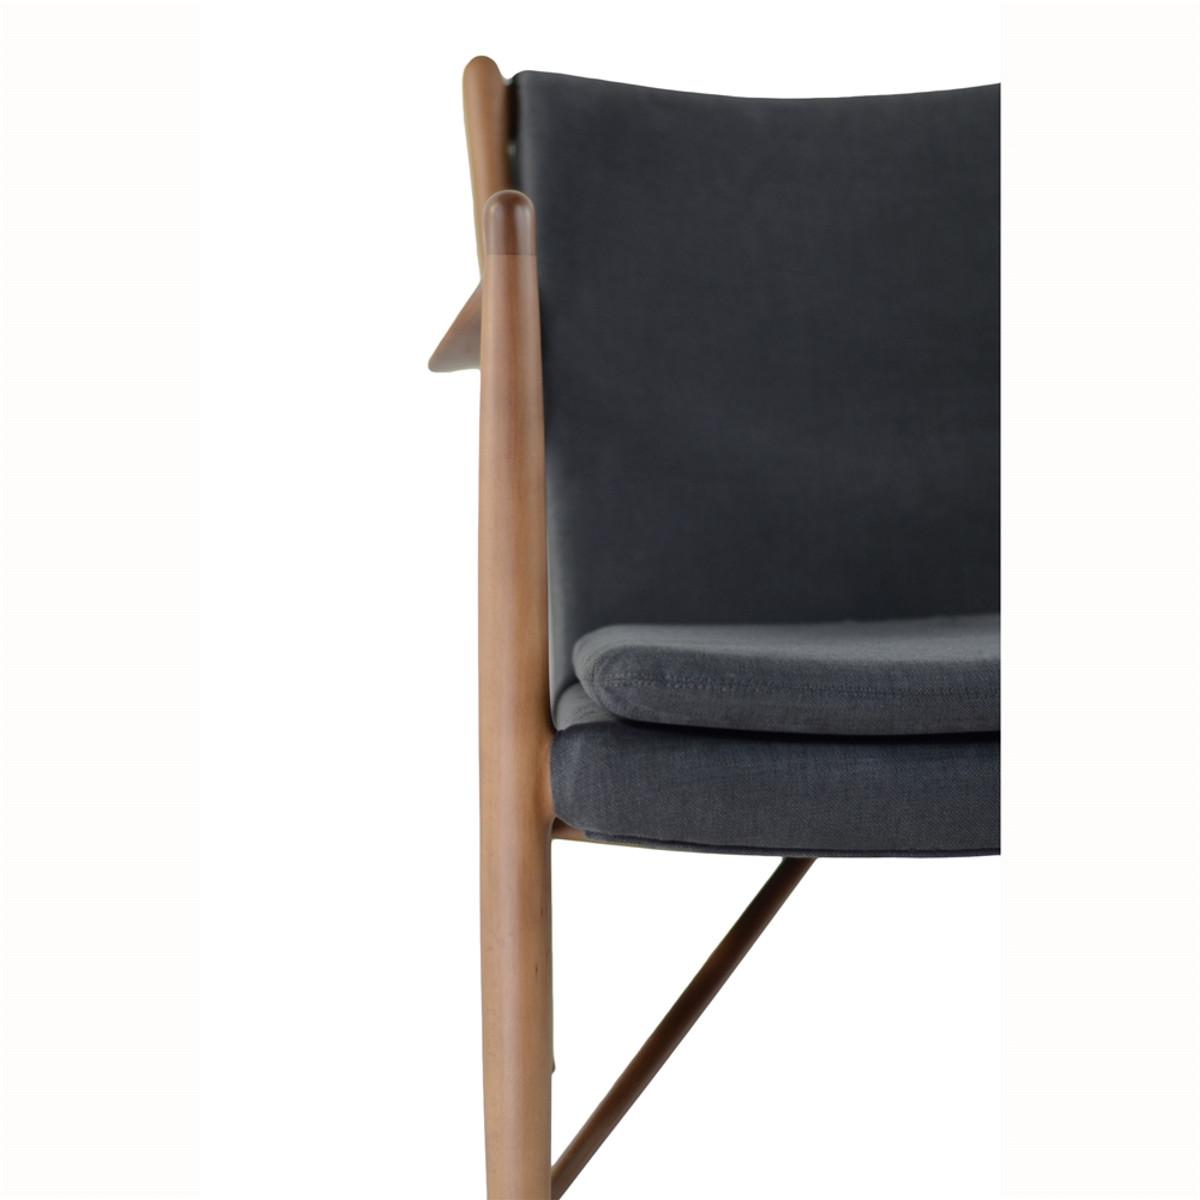 Finn Juhl Inspired 45 Chair Walnut Frame In Dark Grey 5